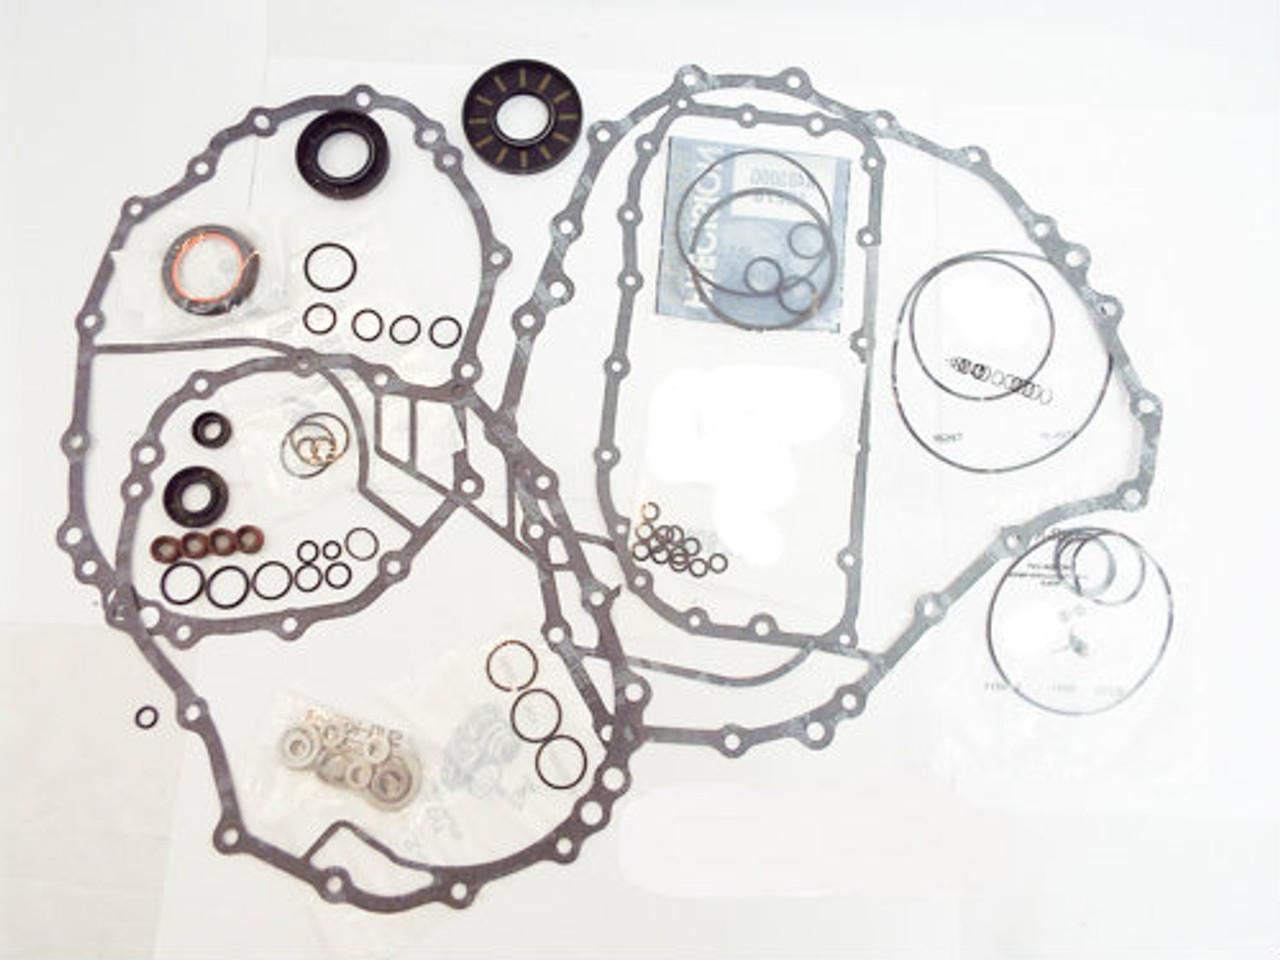 Honda Civic 2001-2005 BMXA SLXA TransmissionGasket /& Seal Rebuild Kit w// Filter